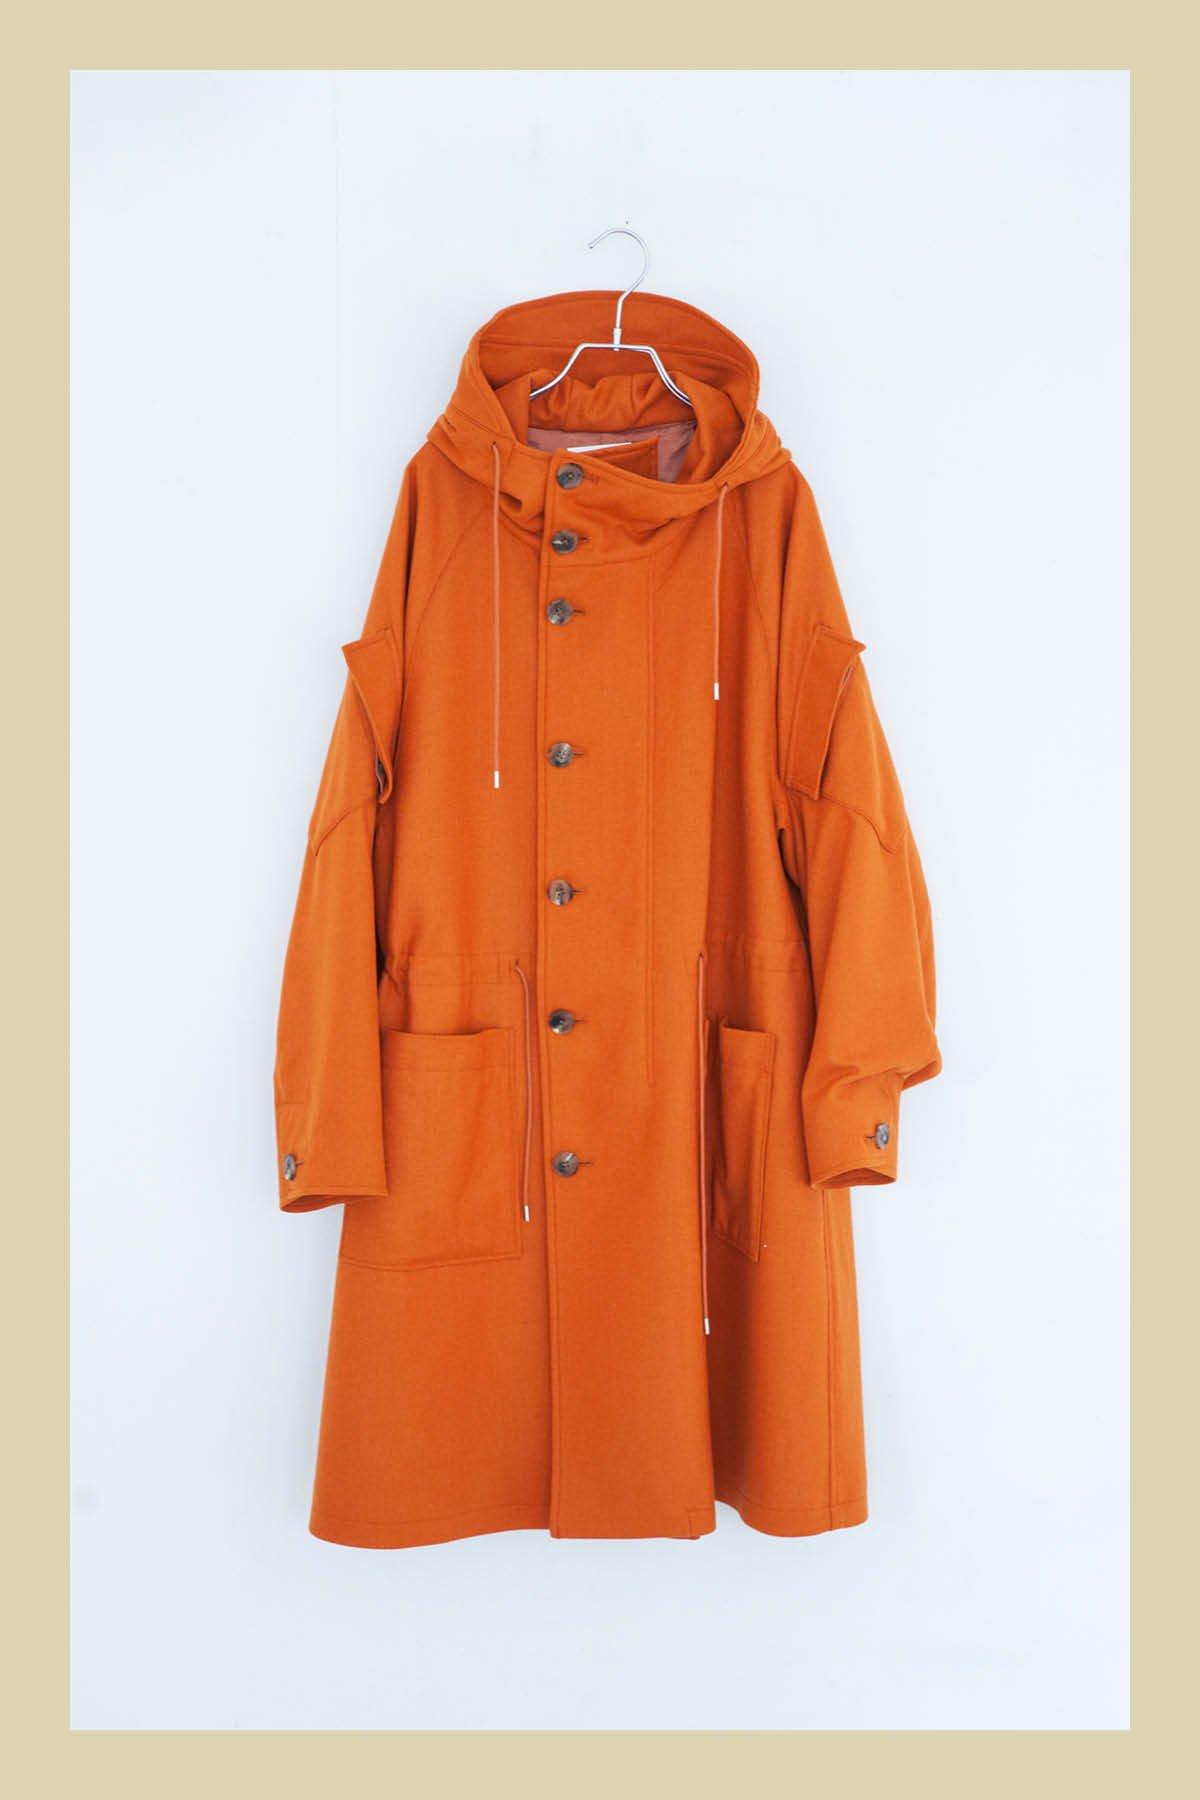 WELLDER / Hooded Coat(ORANGE)